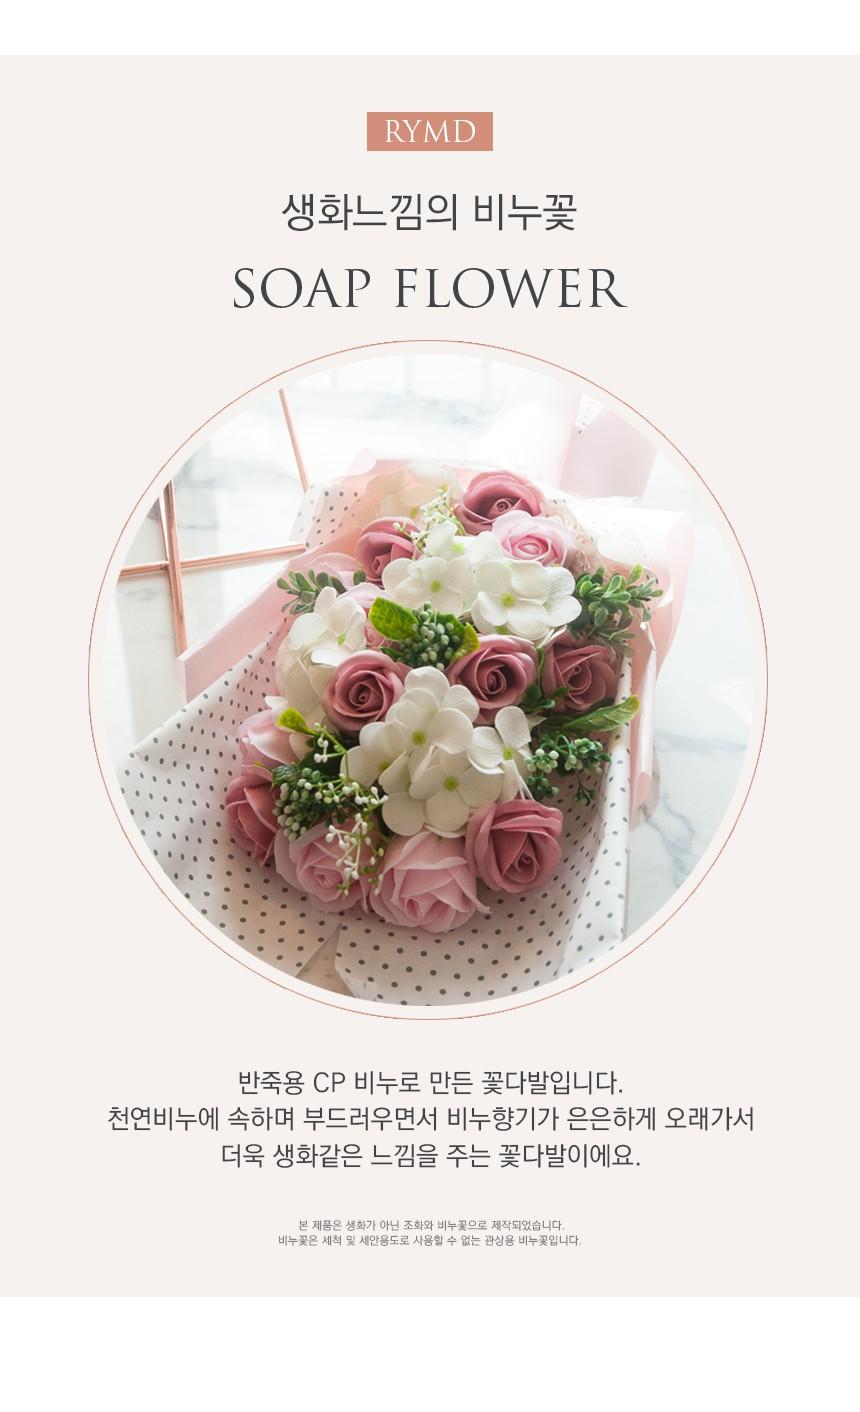 BLOSSOM_PINK_SOAP_FLOWER_BOUQUET_06.jpg